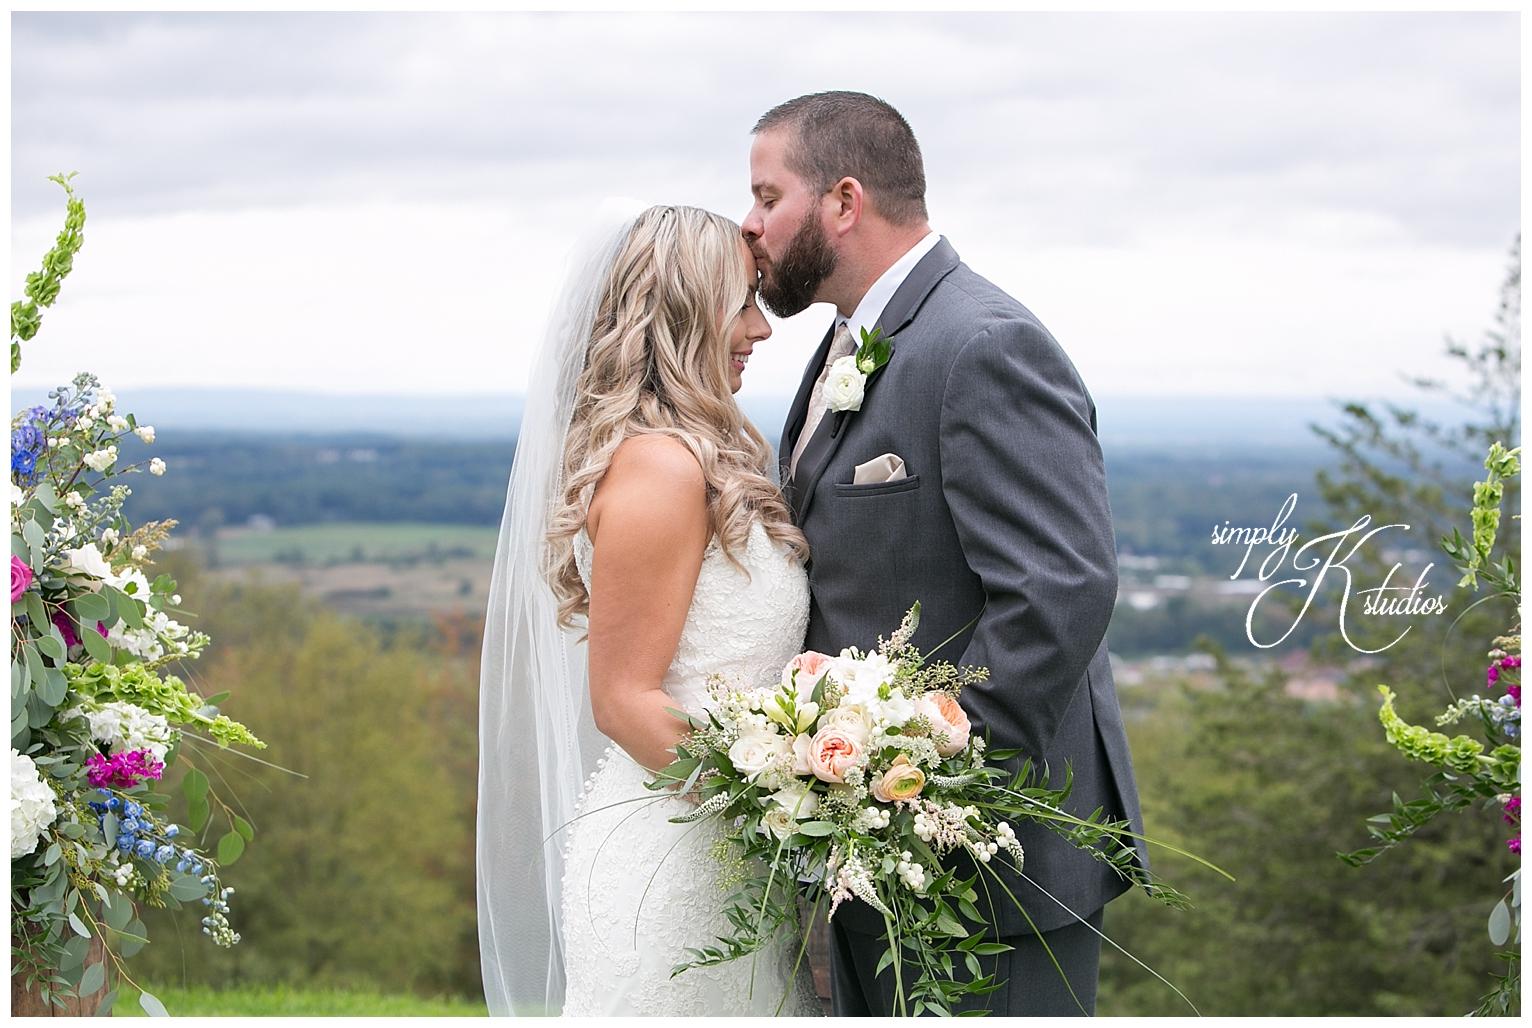 Timeless Wedding Photographers.jpg